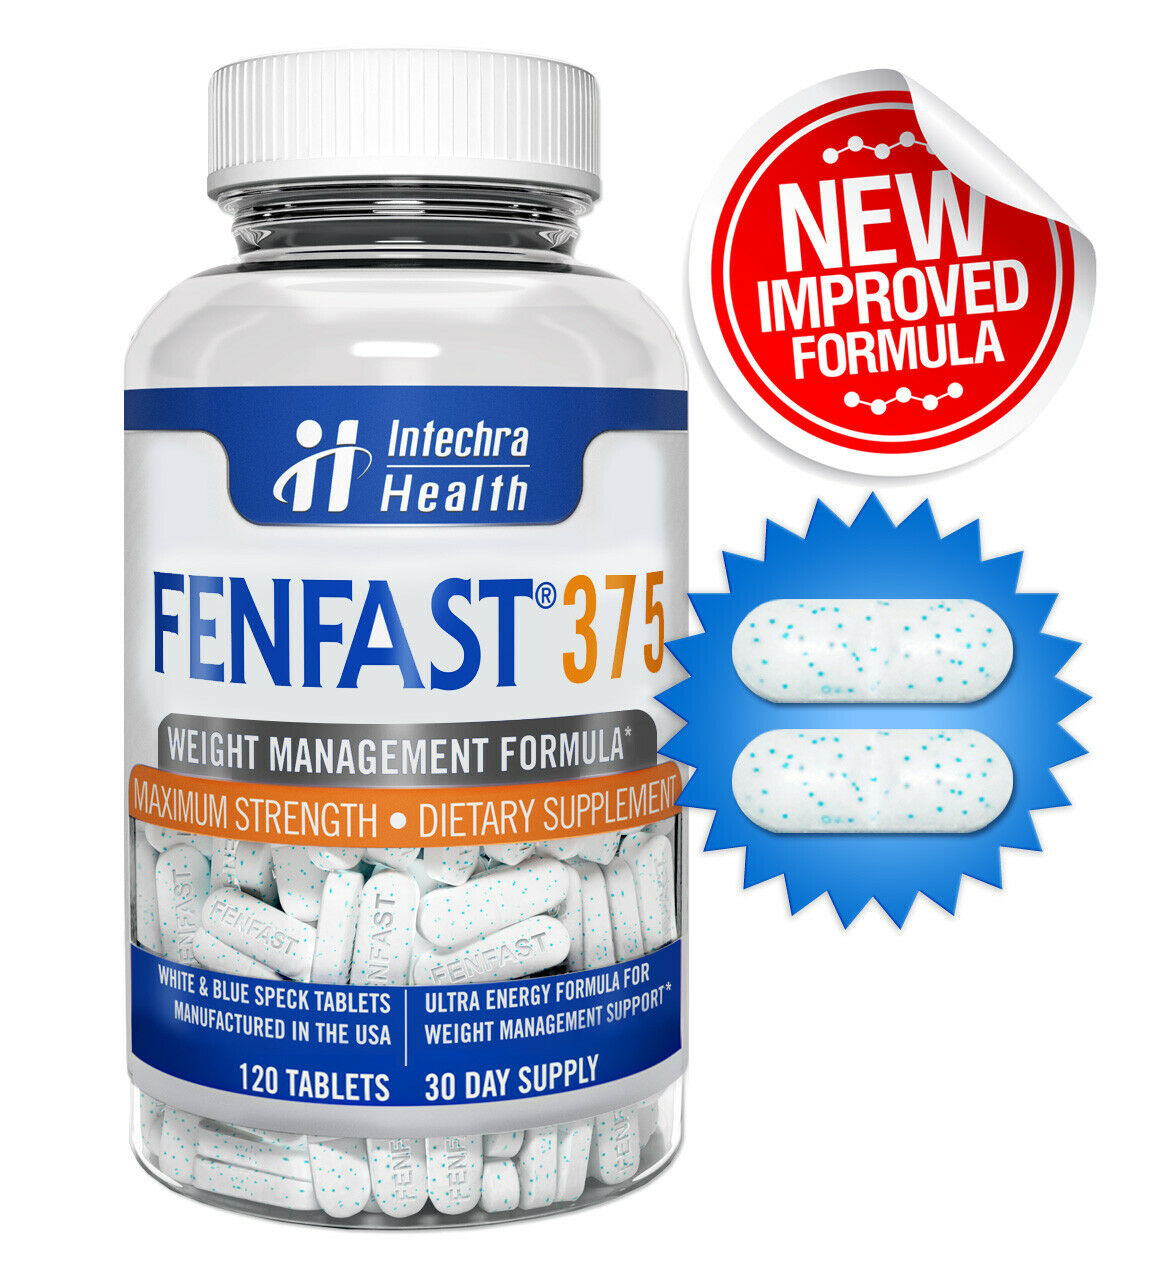 FENFAST 375 Best Weight Loss Diet Pills + Maximum Energy 120 White/Blue Tablets  3